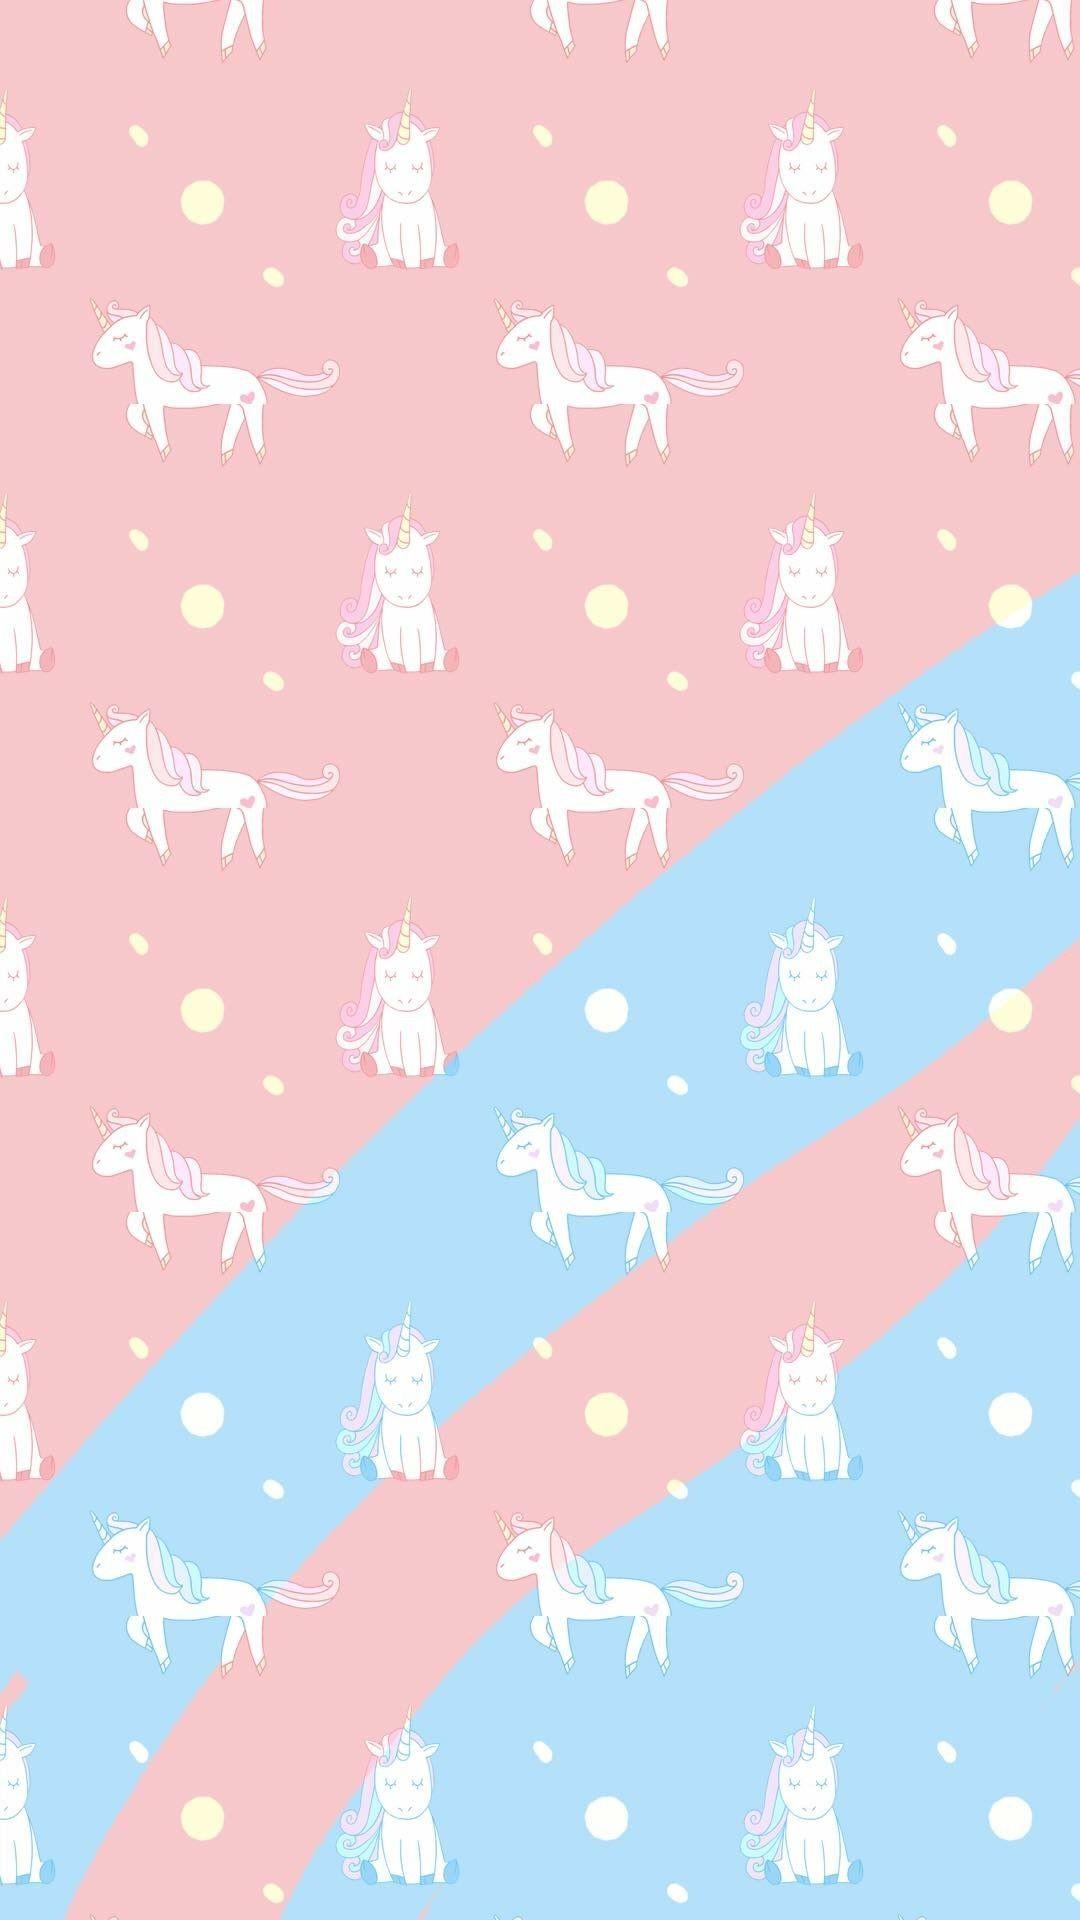 69 Unicorns Wallpapers on WallpaperPlay 1080x1920